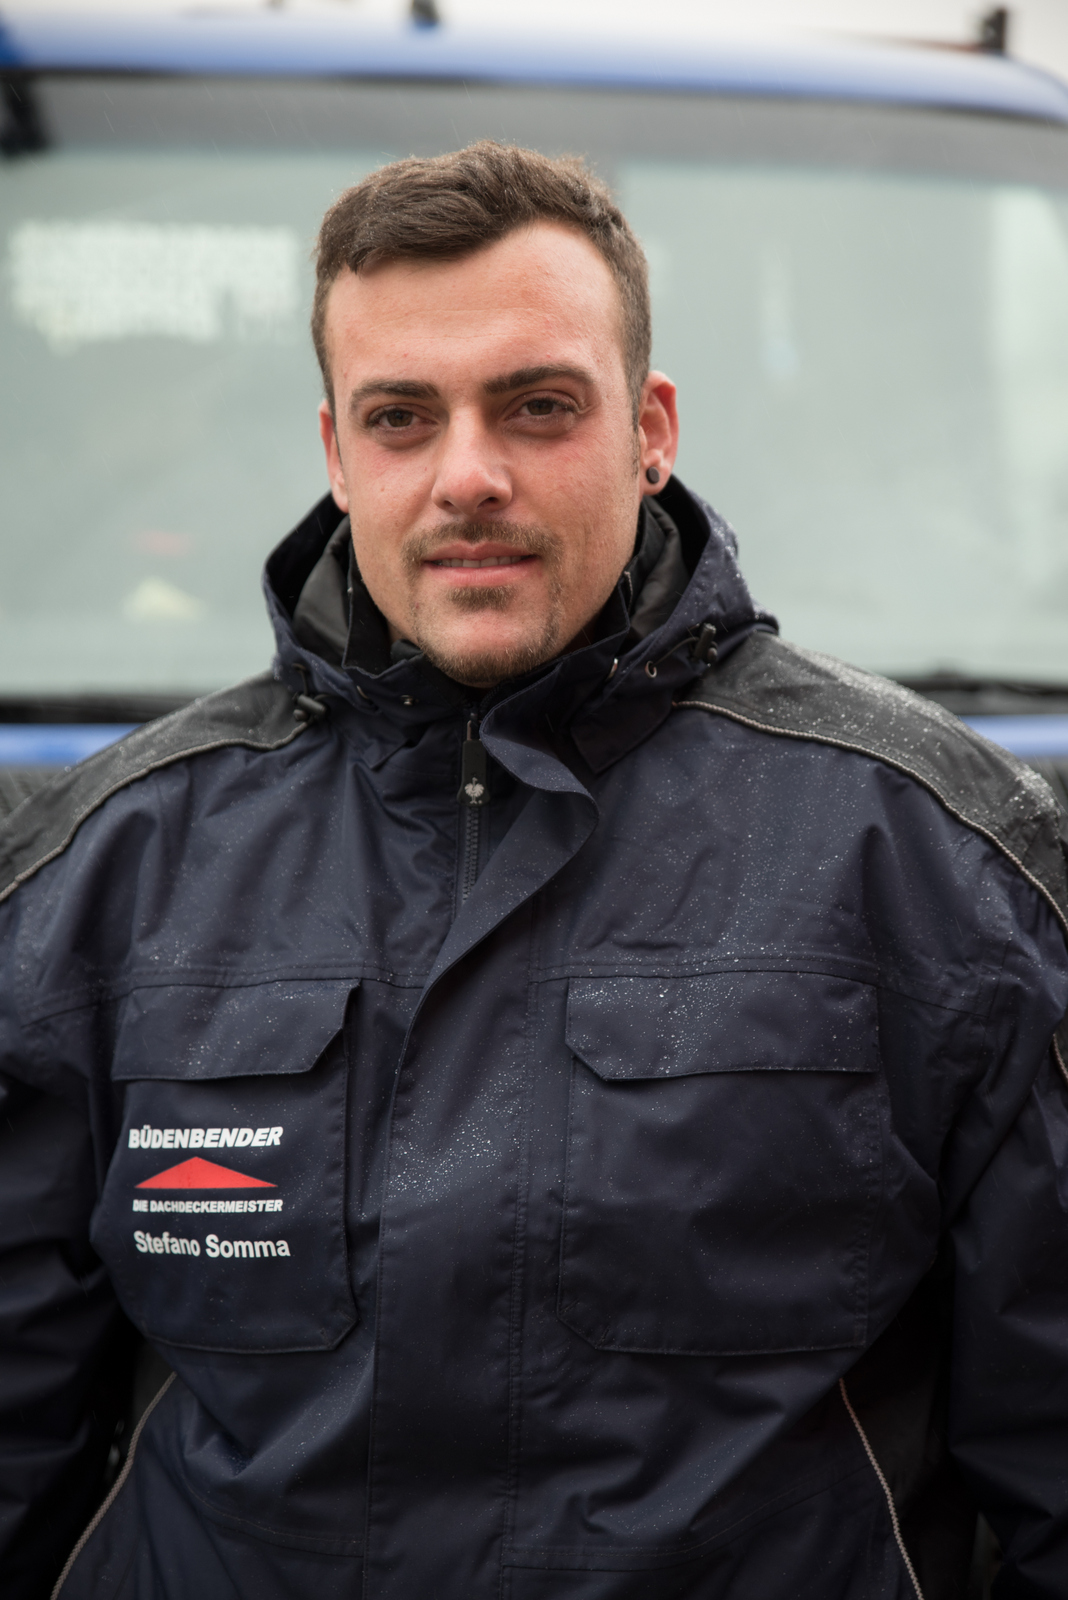 Stefano Somma